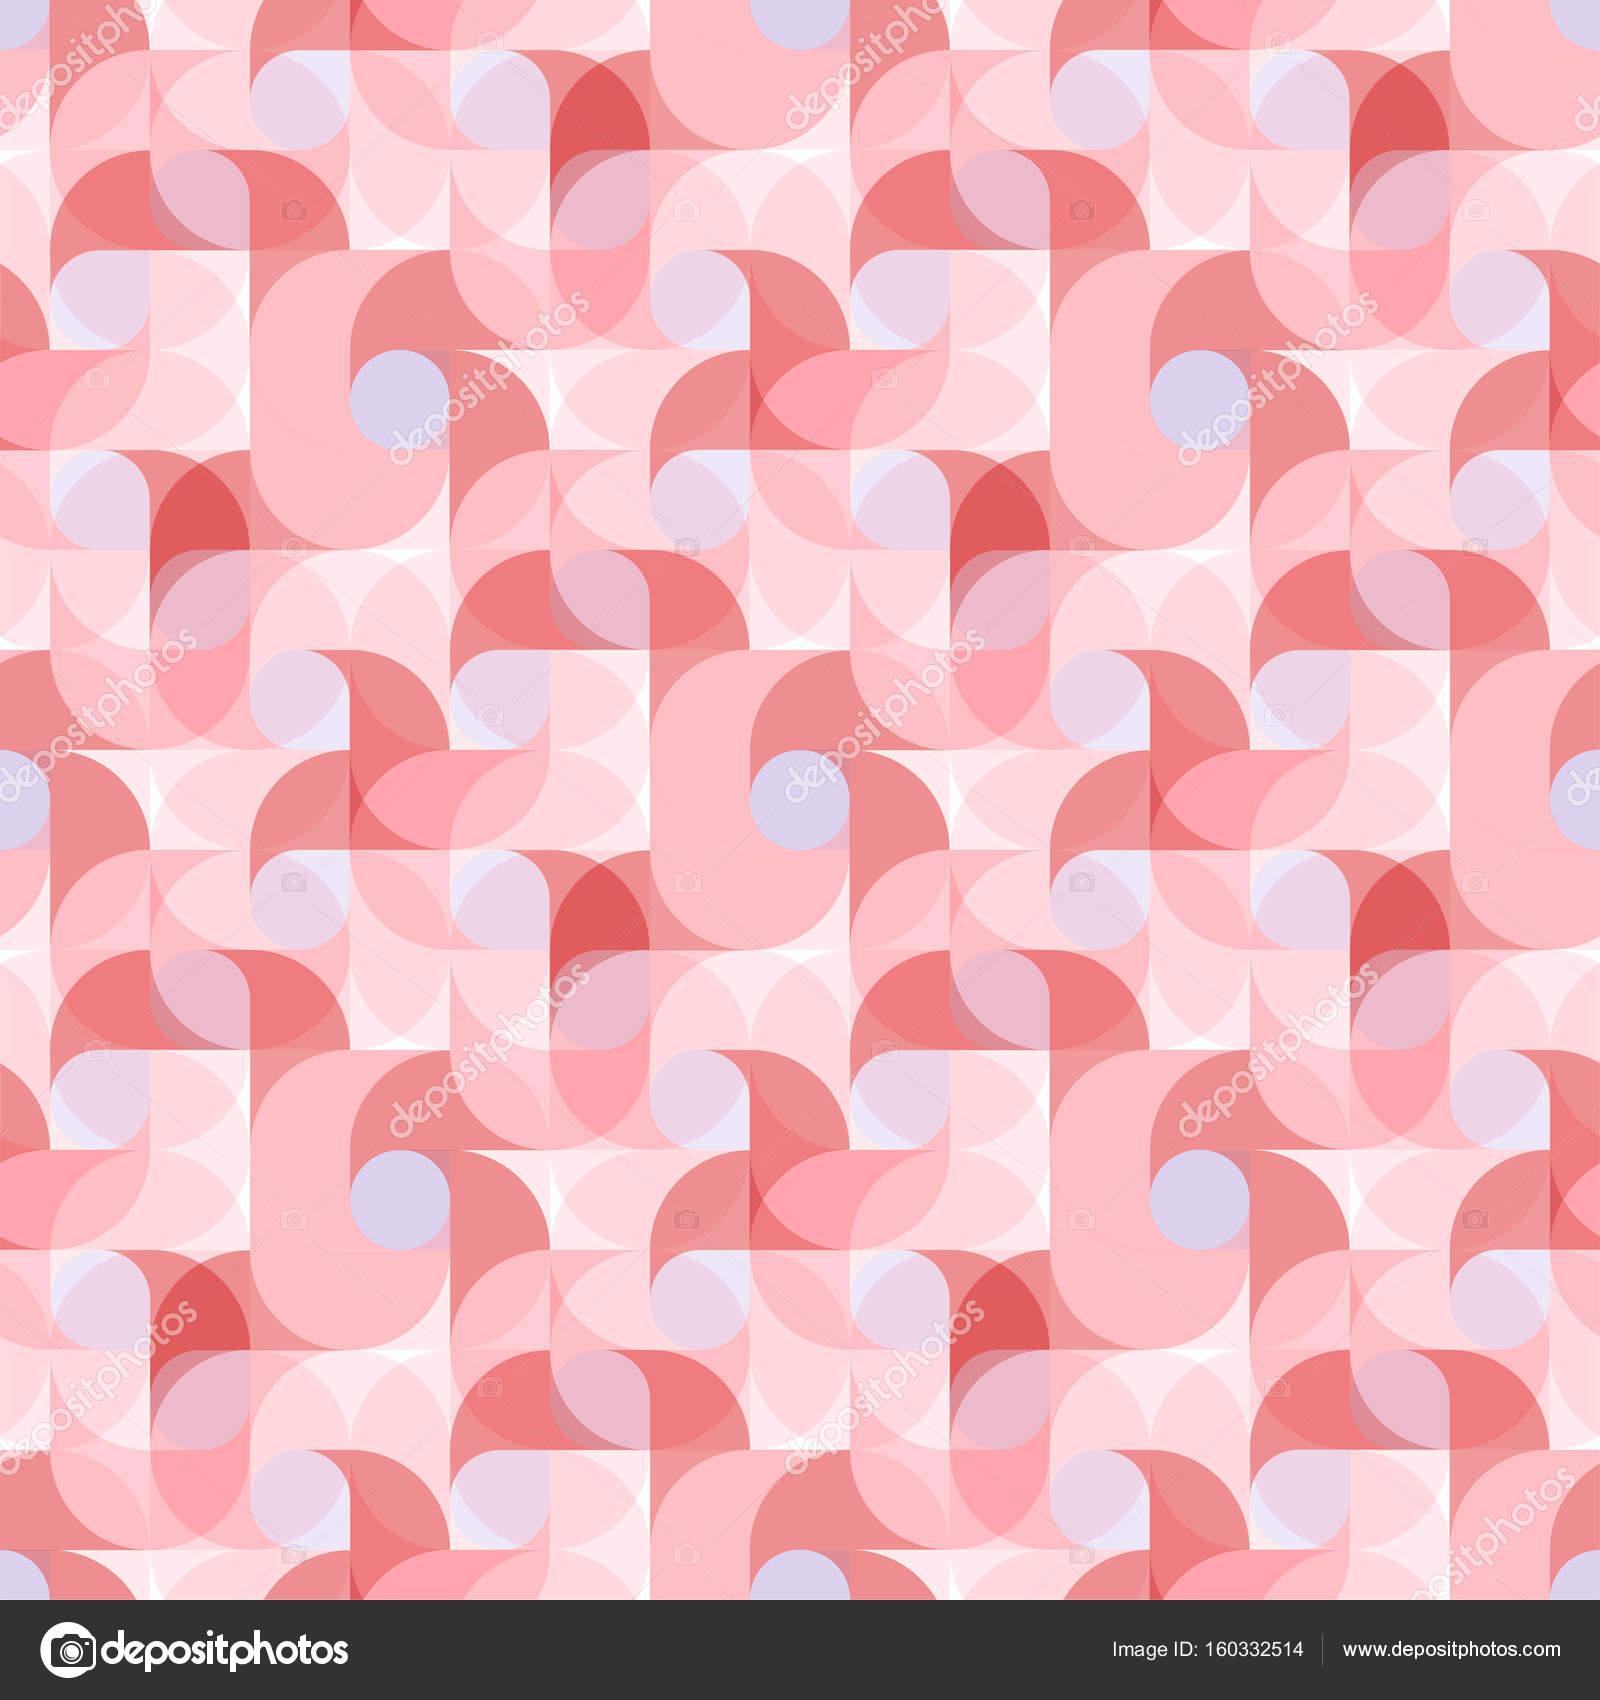 reguläre radiale Geometrien — Stockvektor © uzhveko #160332514